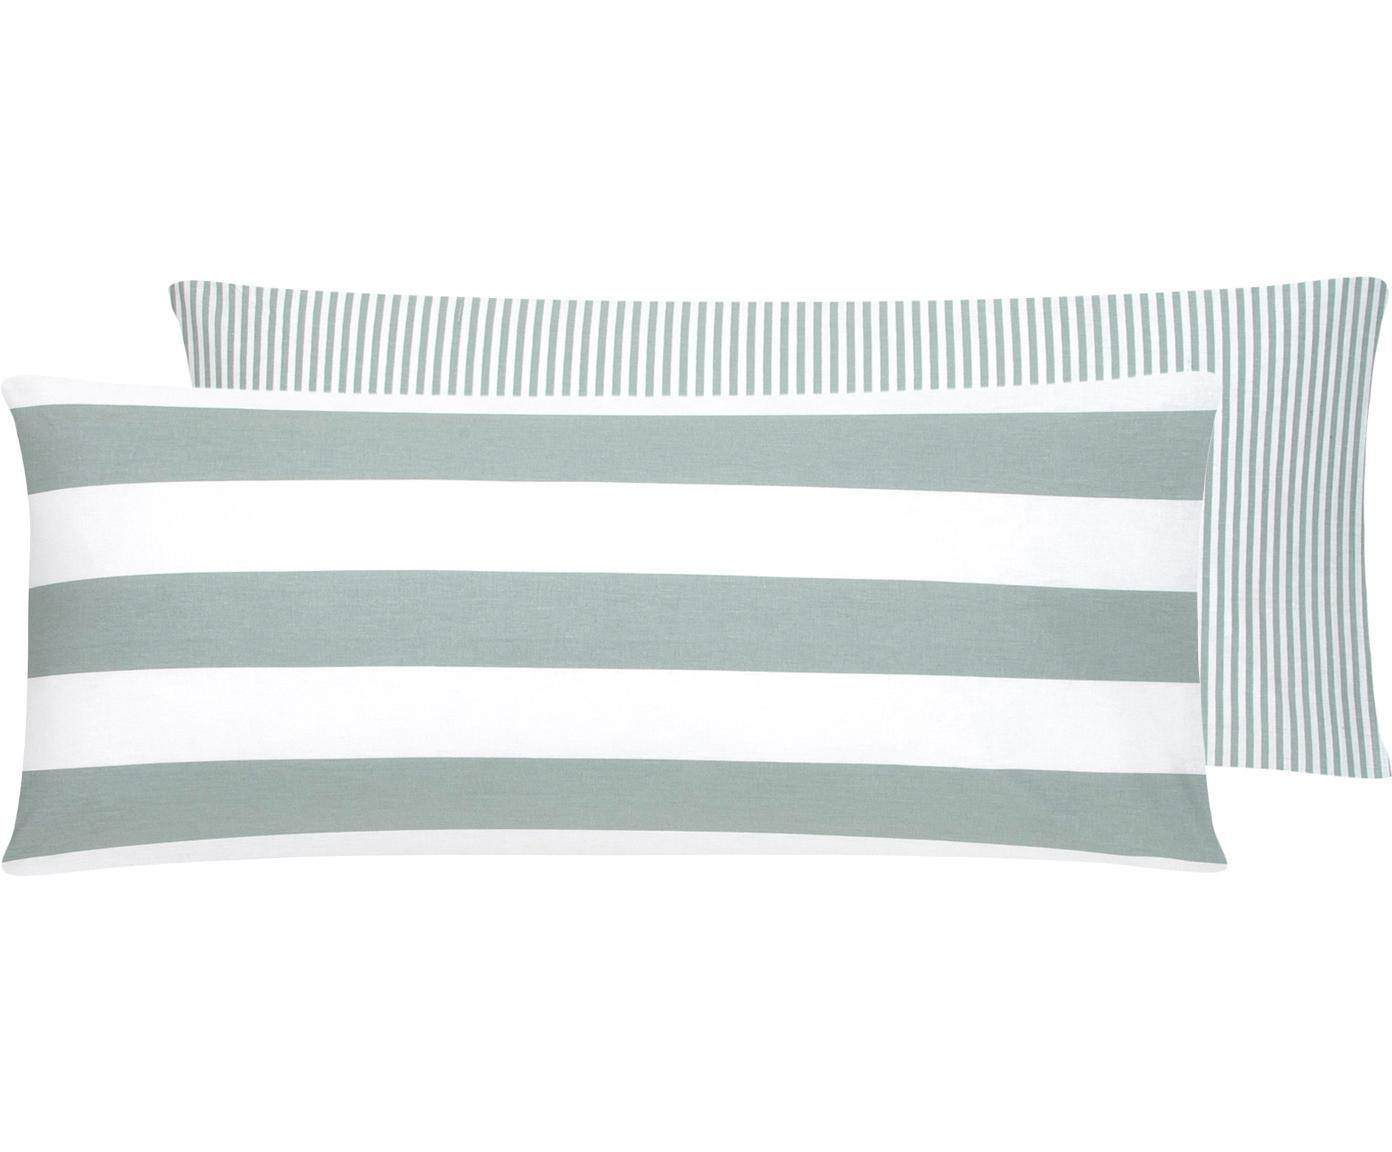 Funda de almohada de tejido renforcé Lorena, caras distintas, Verde salvia, blanco, An 45 x L 110 cm